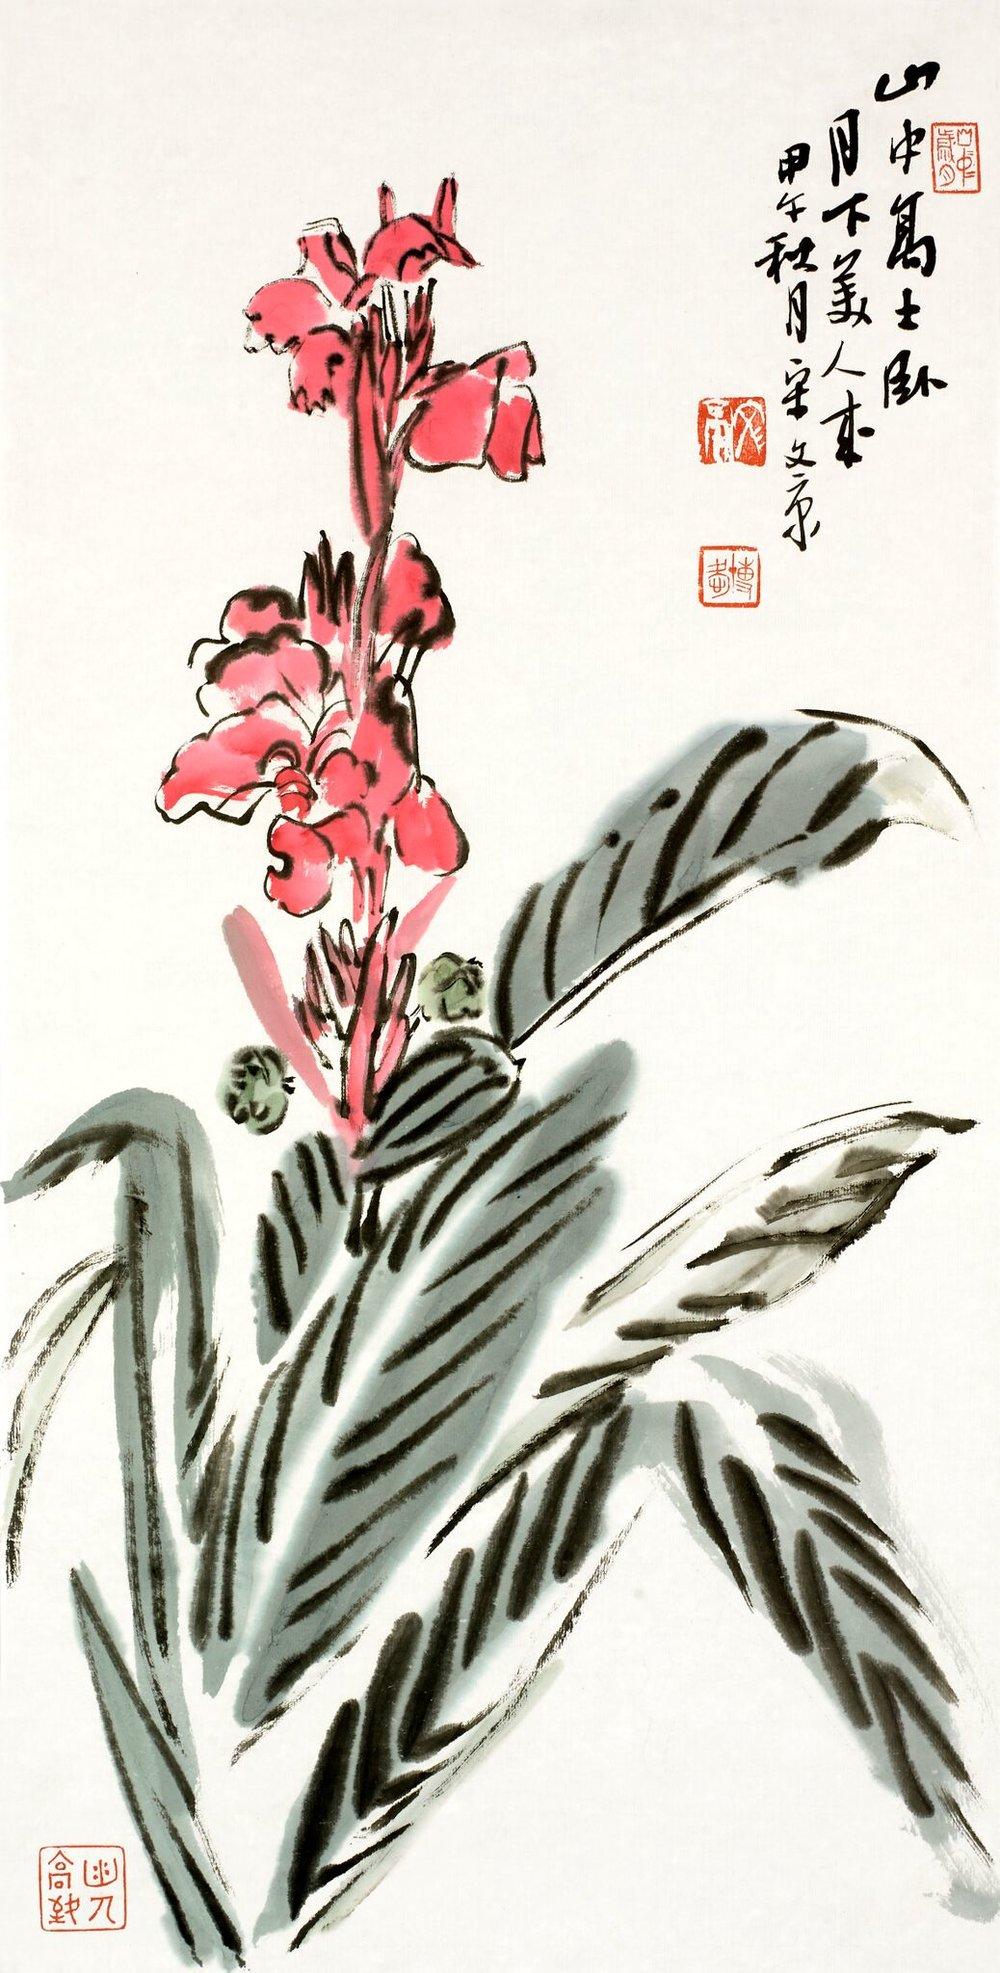 2 Song Wenjing Art.jpg